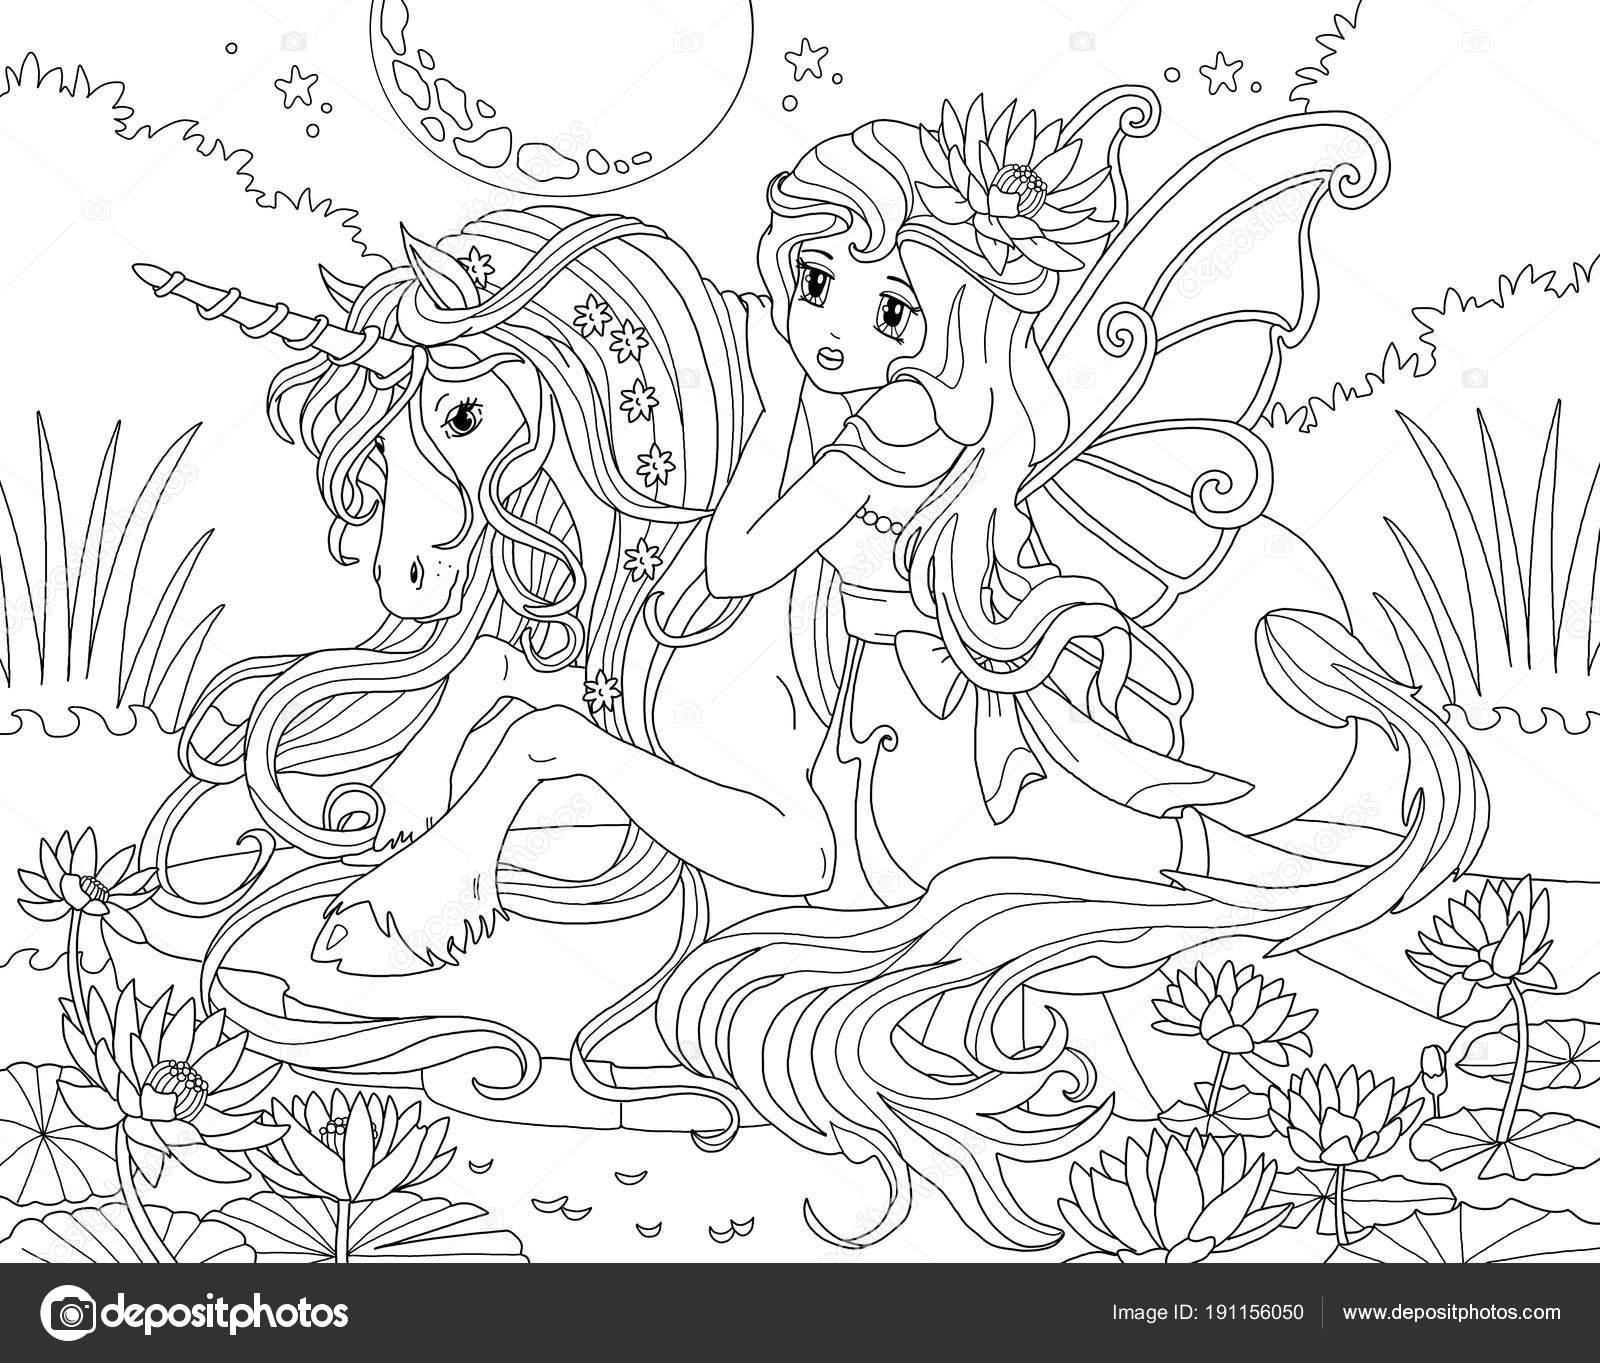 Coloriage Princesse Avec Licorne.Coloriage Licorne Princesse Photographie Larisakuzovkova C 191156050